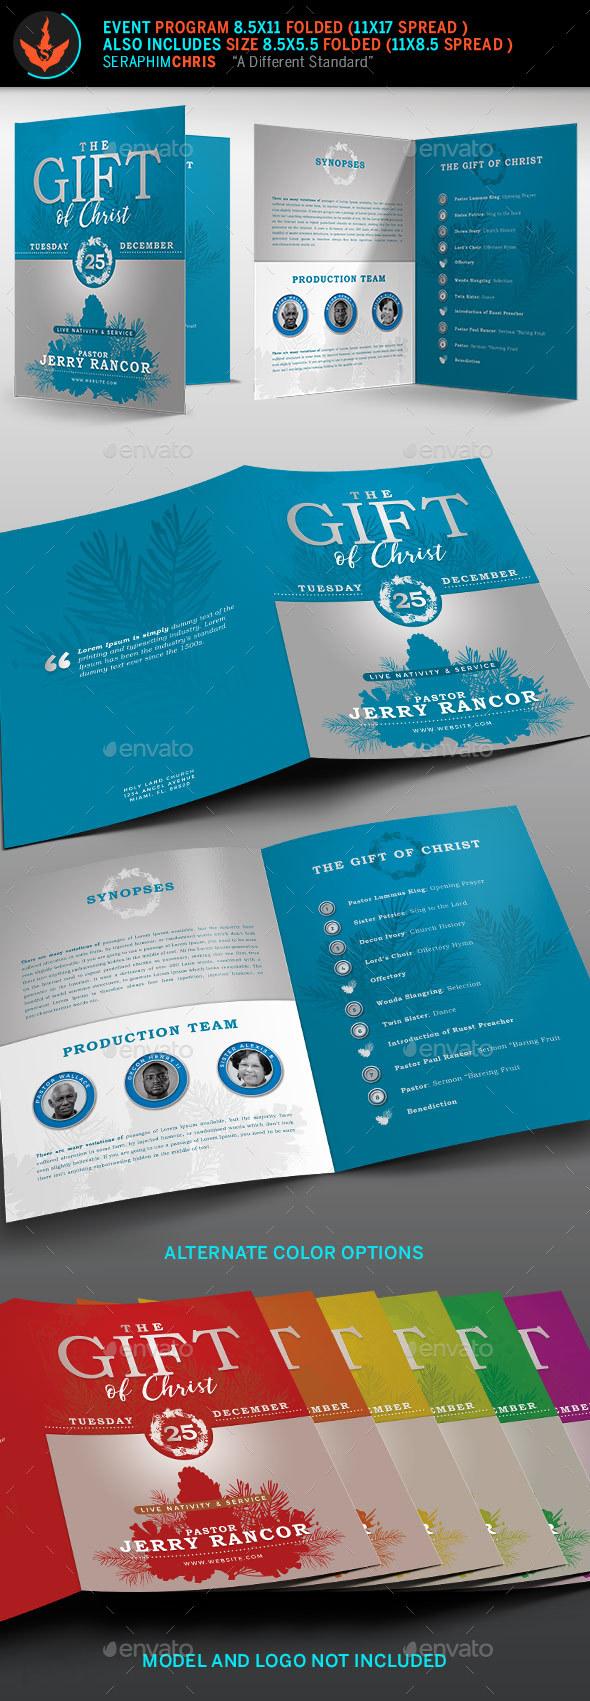 The Gift of Christ Christmas Program Template - Informational Brochures